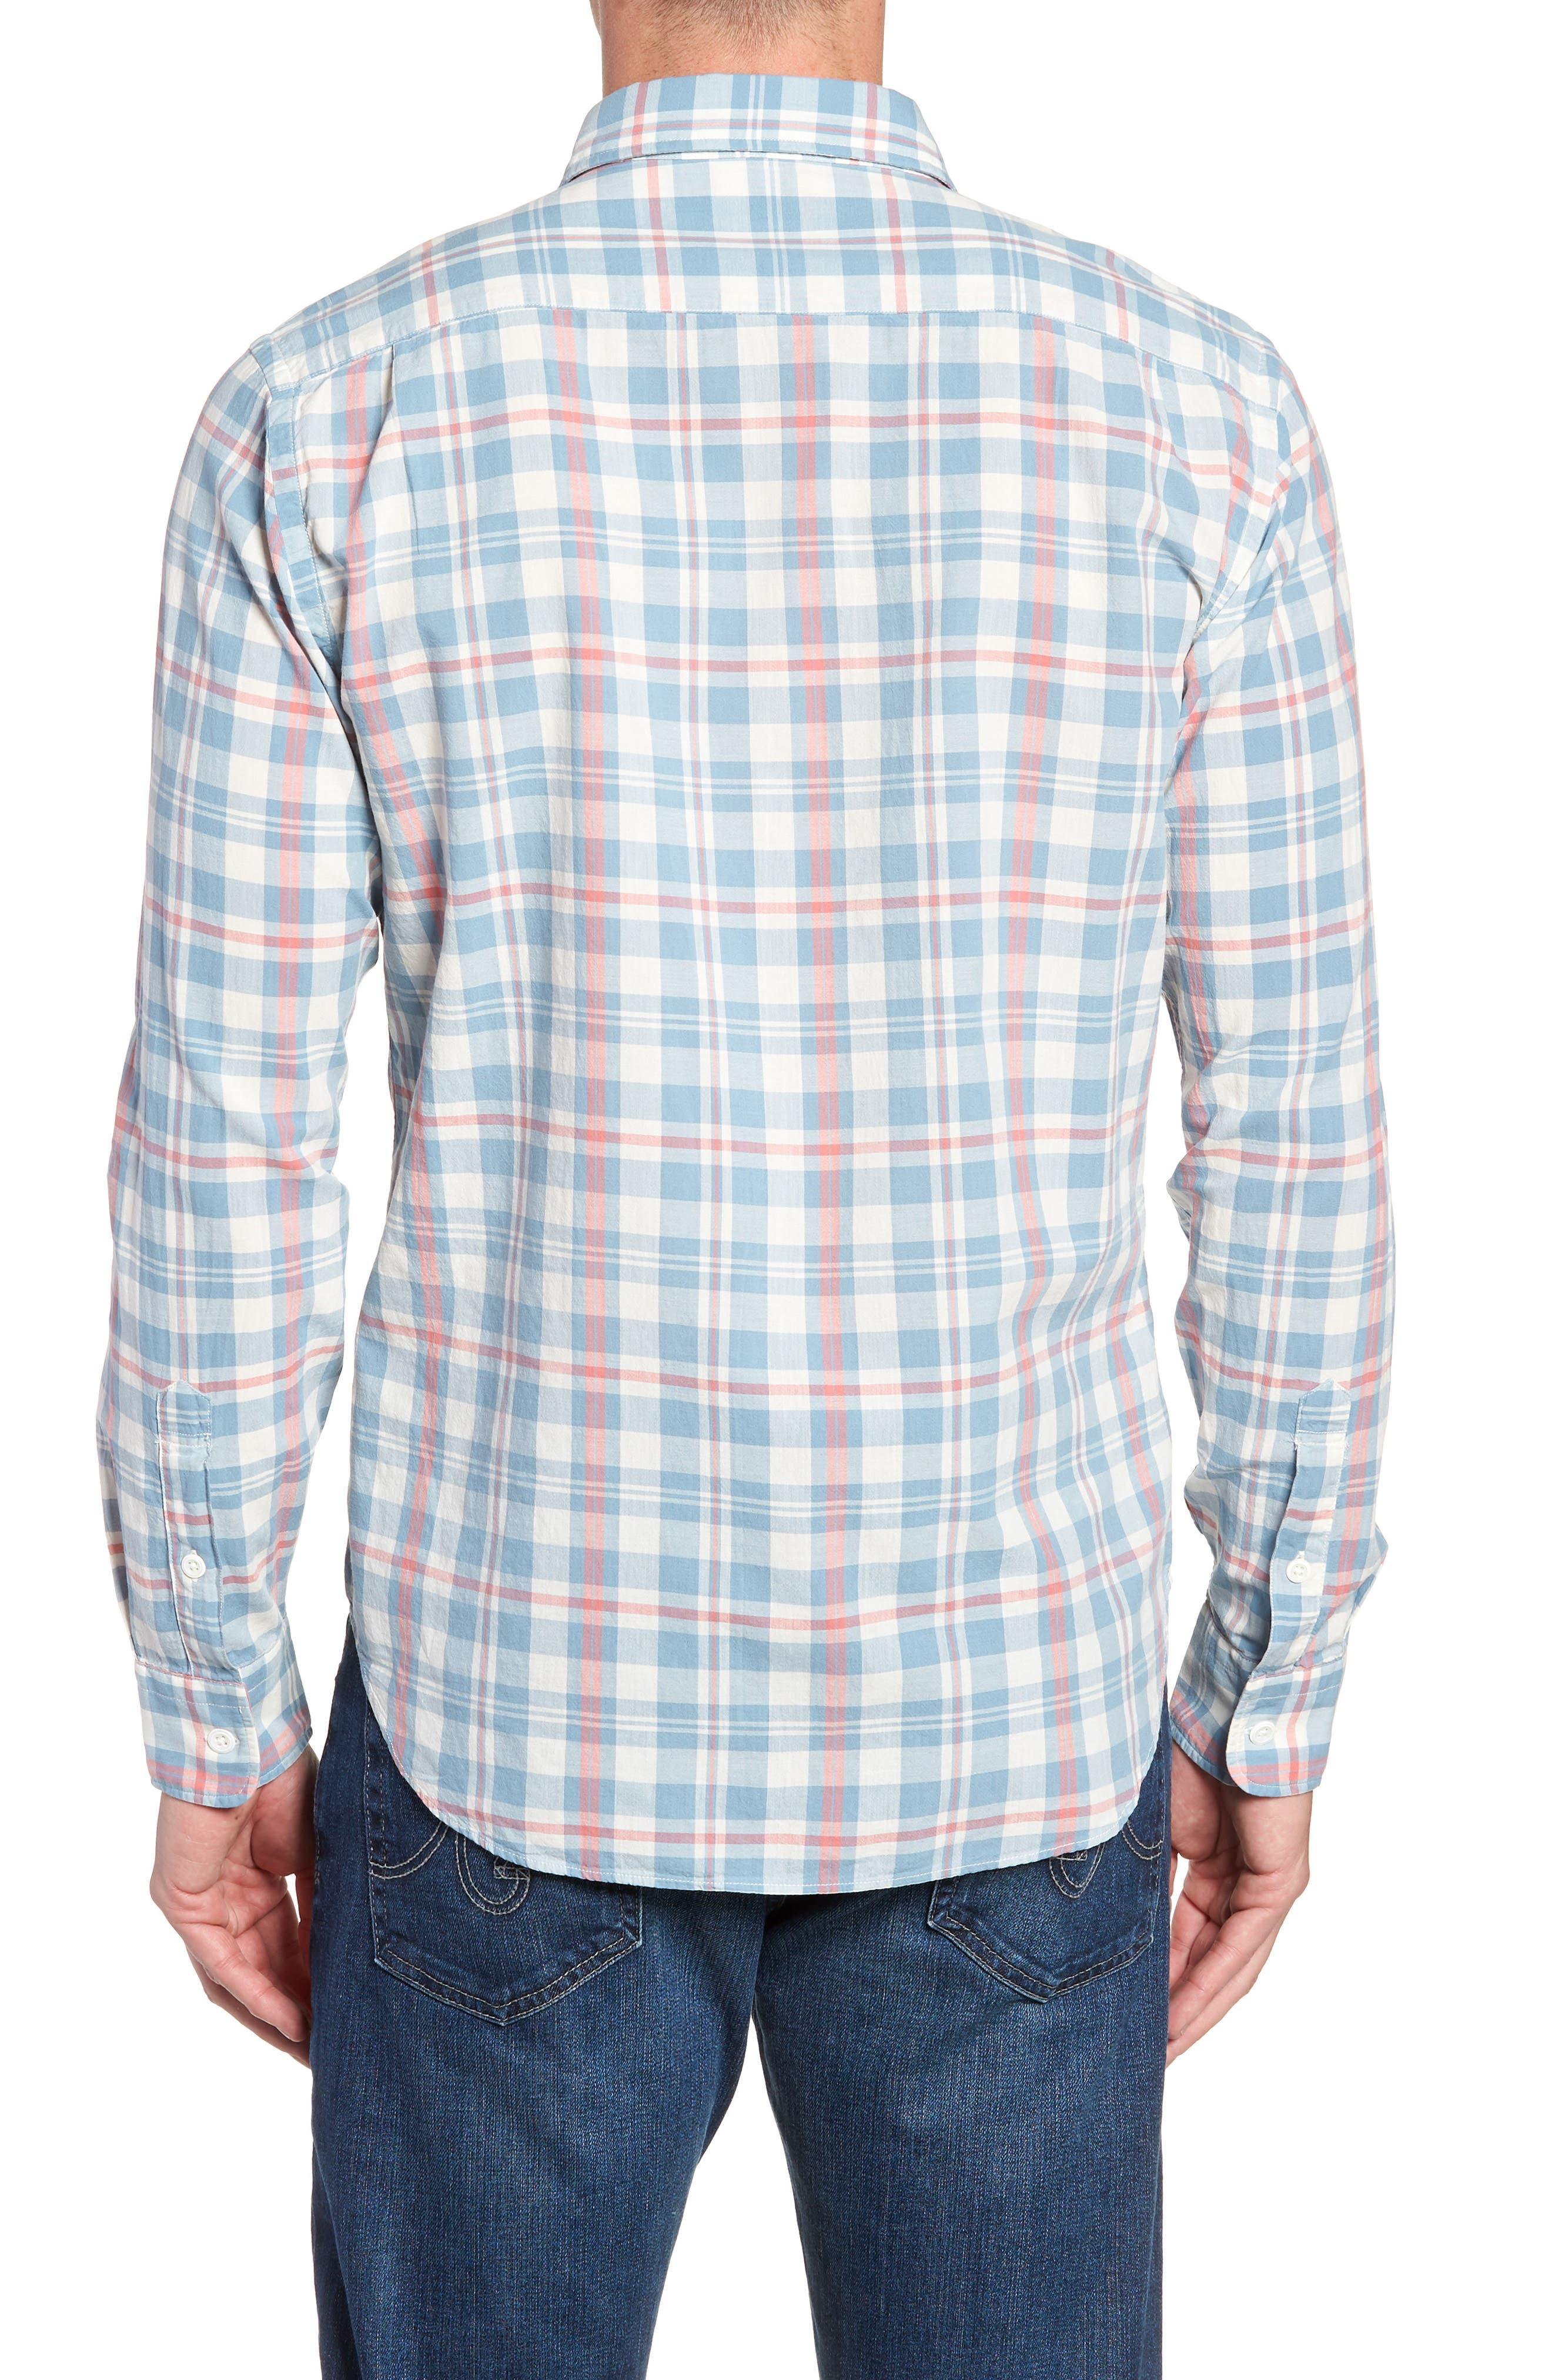 Ventura Plaid Sport Shirt,                             Alternate thumbnail 2, color,                             WASHED BLUE CREAM